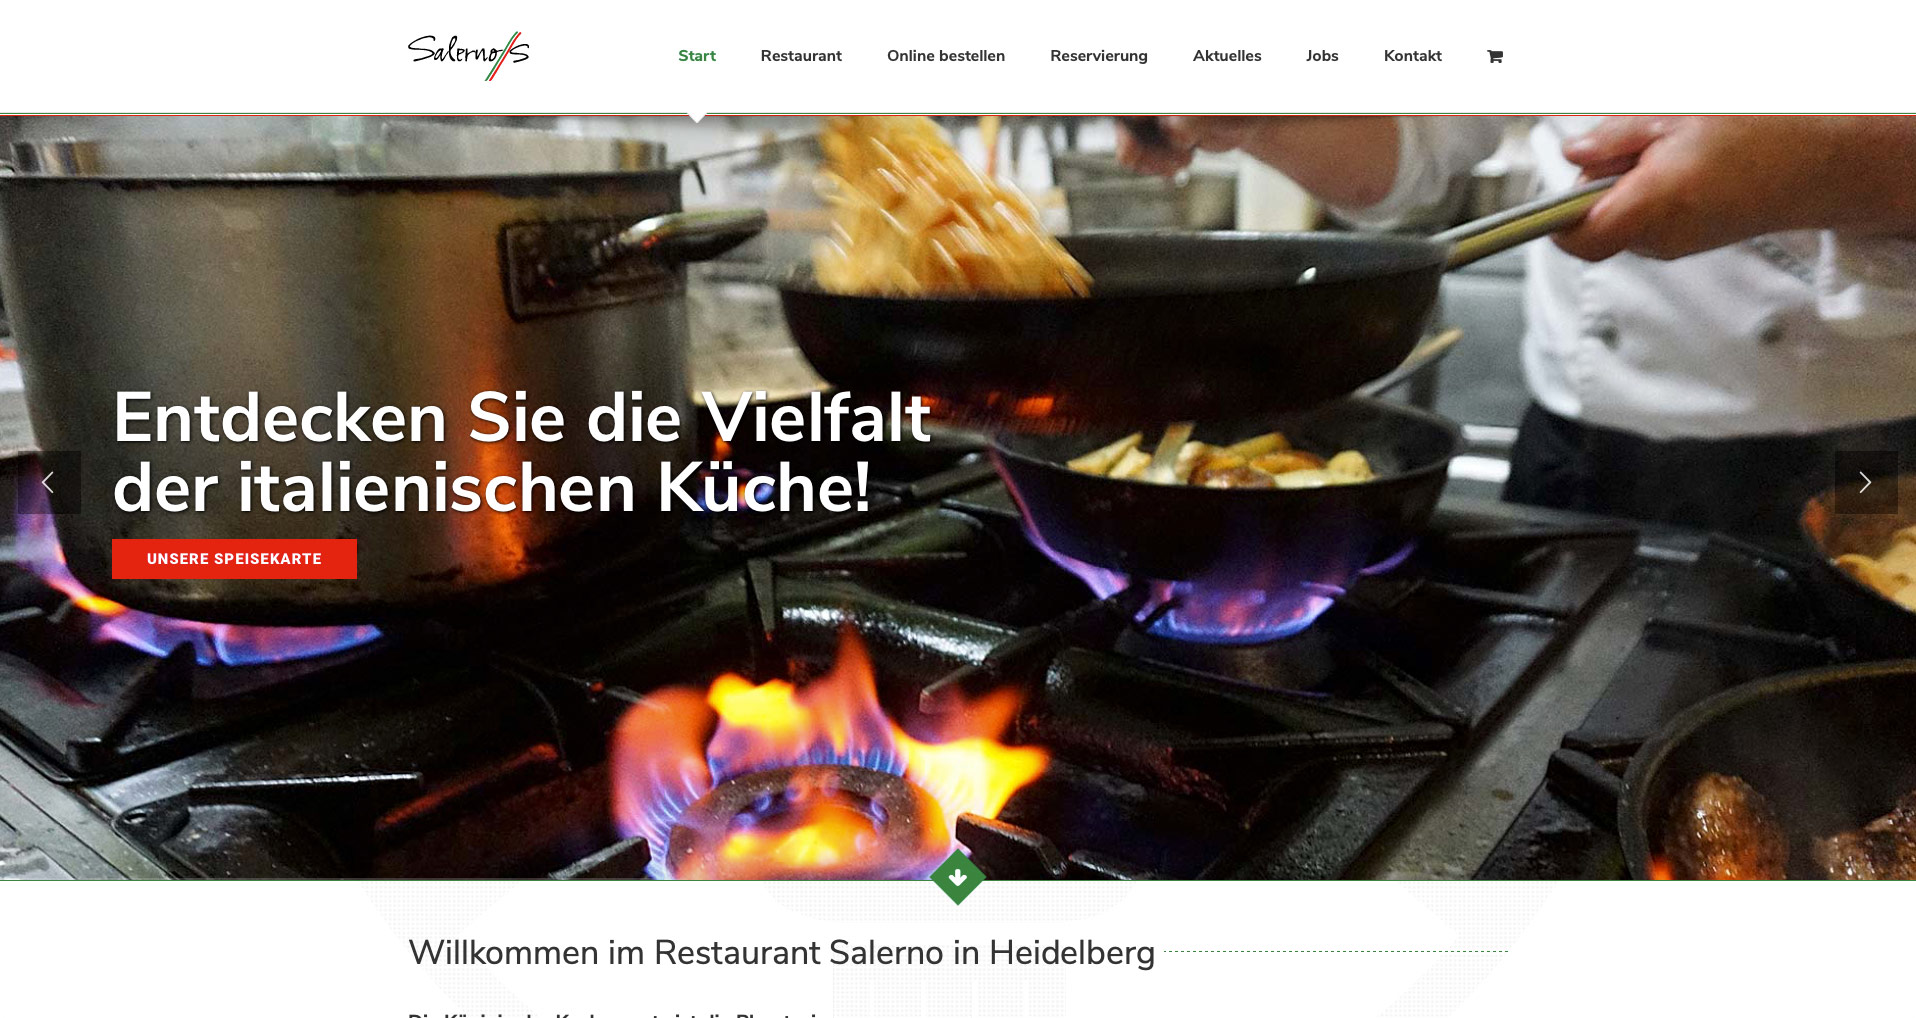 P1XEL - WordPress Website und WooCommerce Online Lieferdienst Salerno in Heidelberg